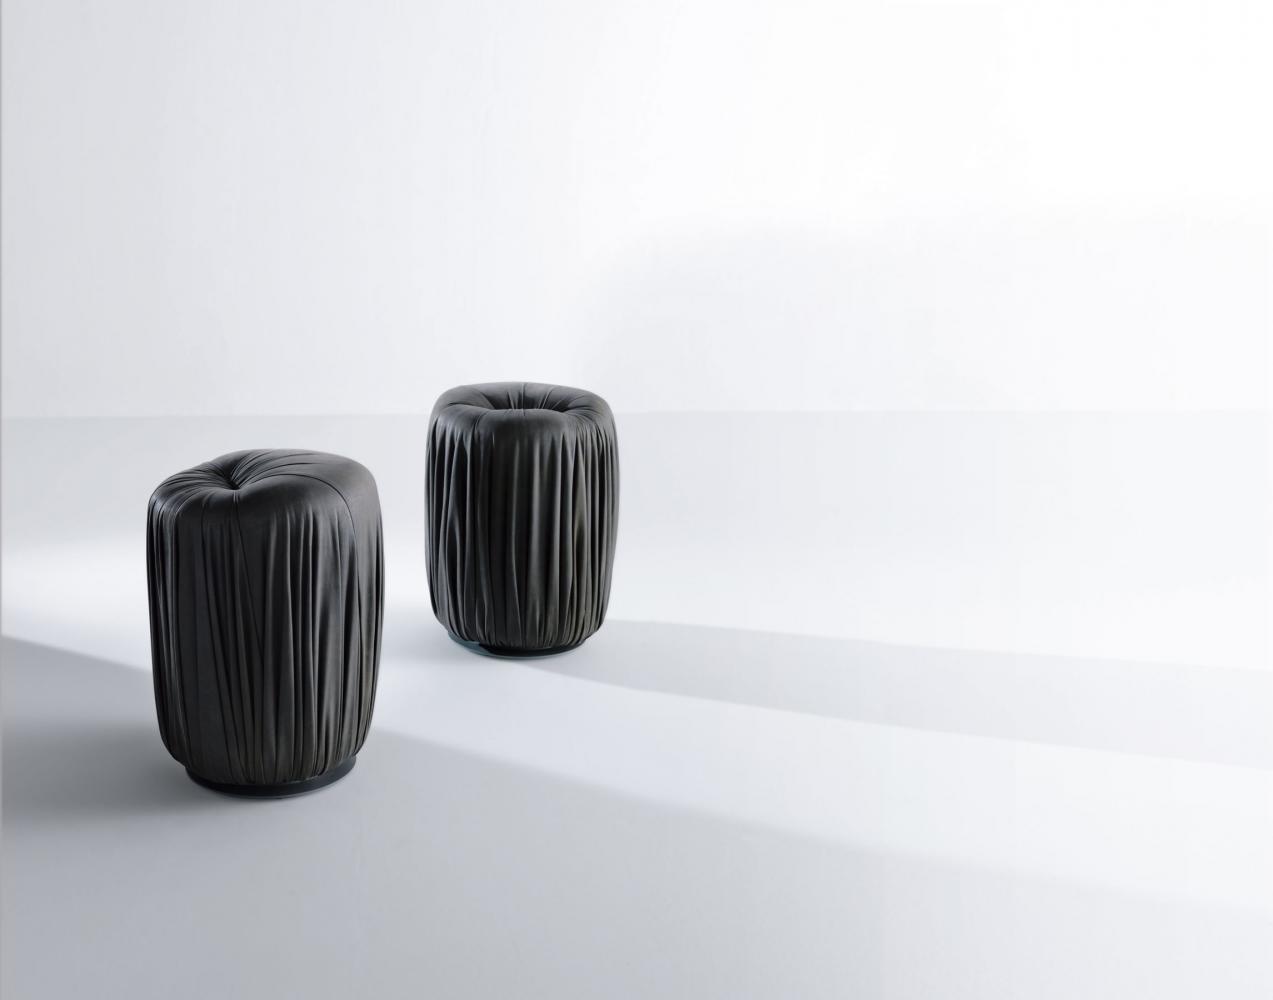 Drapè Poufs are leather or velvet luxury ottomans with pleats